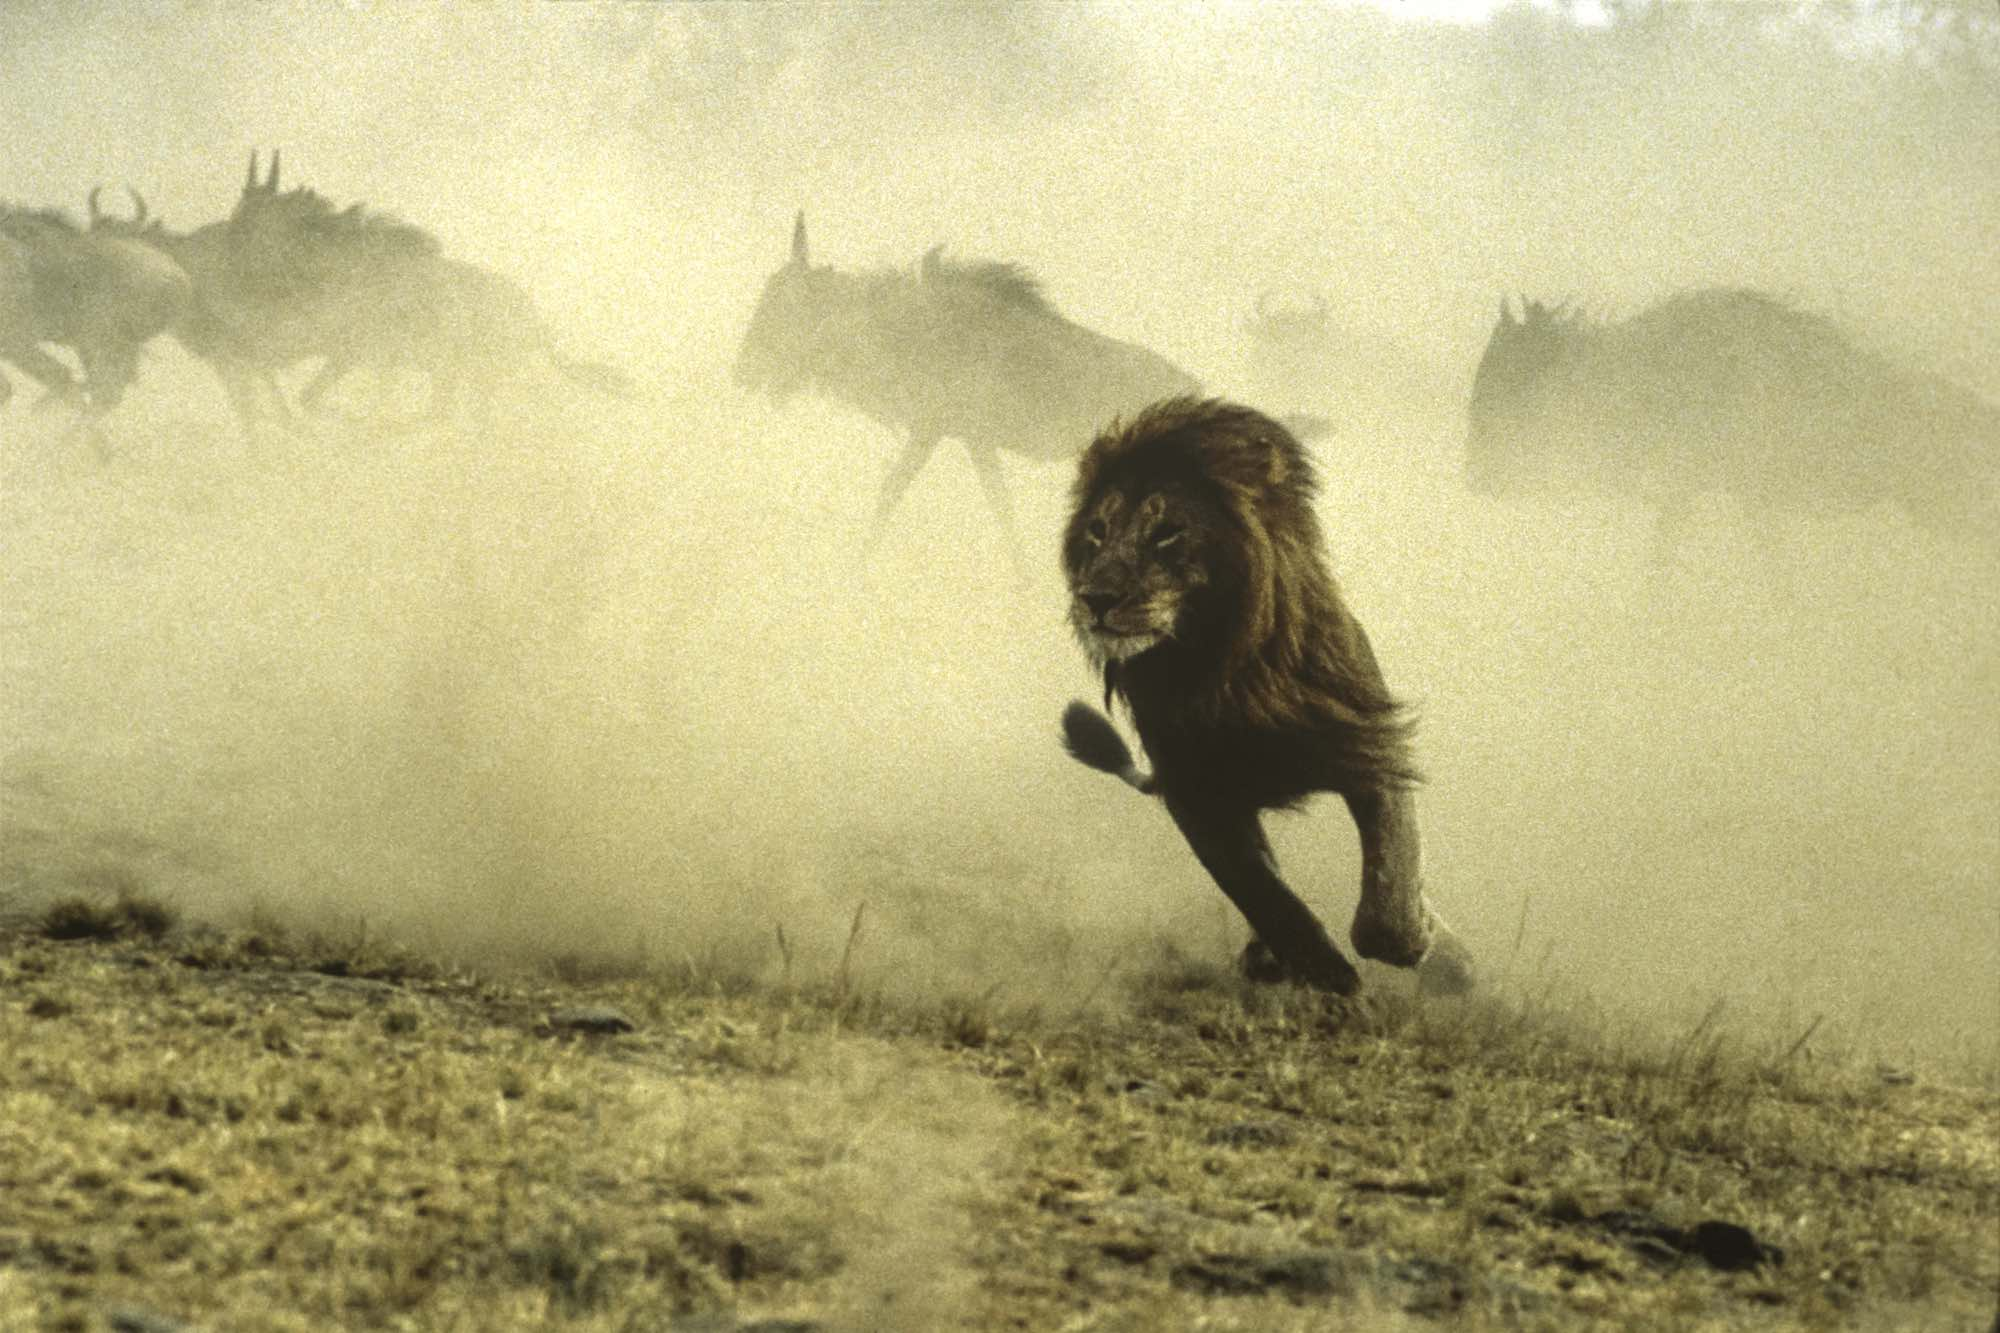 Lion, Kenya - Yann Arthus-Bertrand Photo